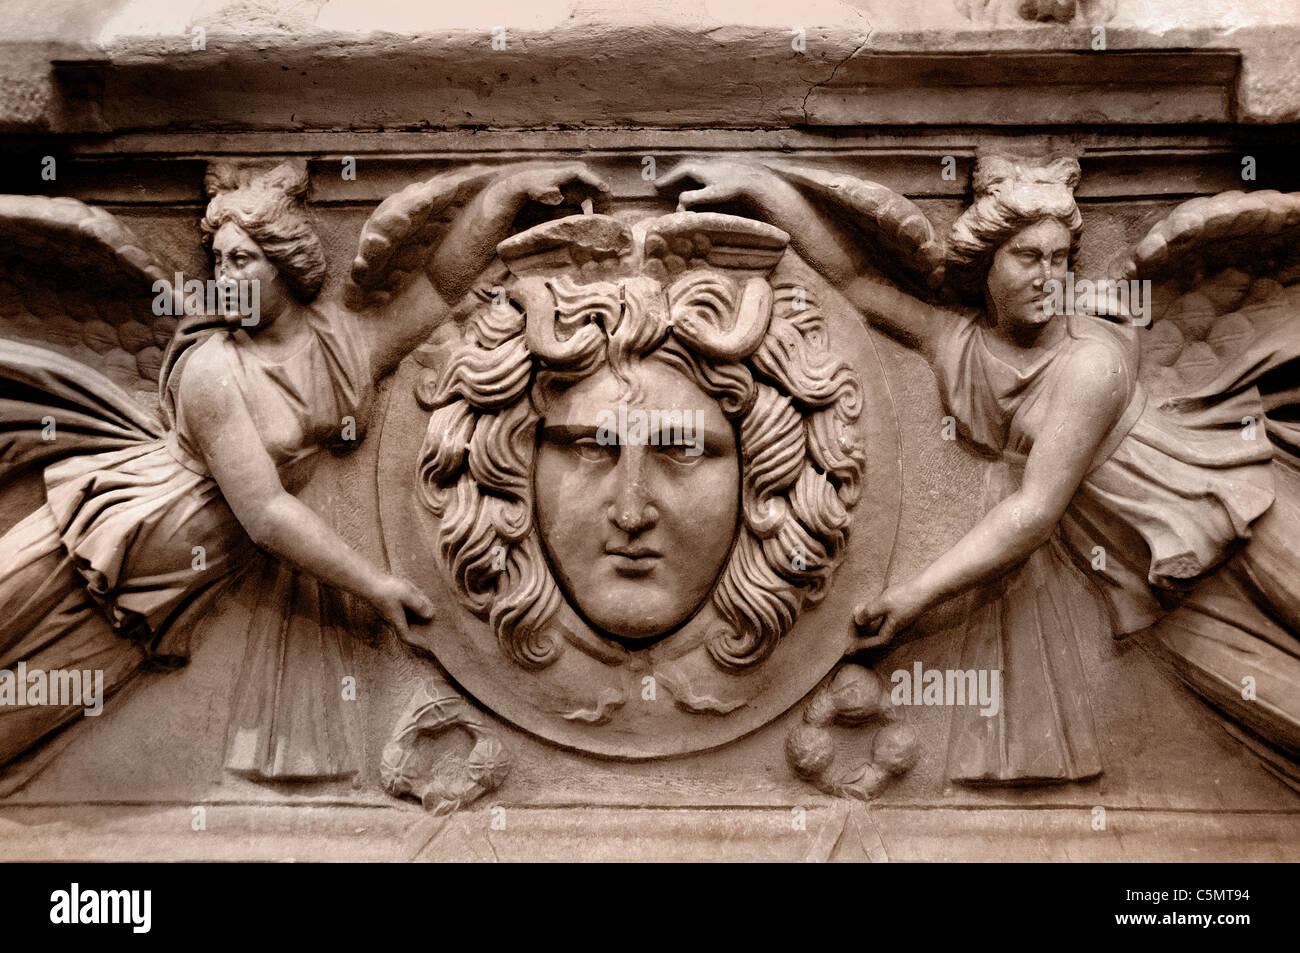 Sarcophagus Tomb Medallion Roman Perge Perga 2 Cent AD Turkey - Stock Image